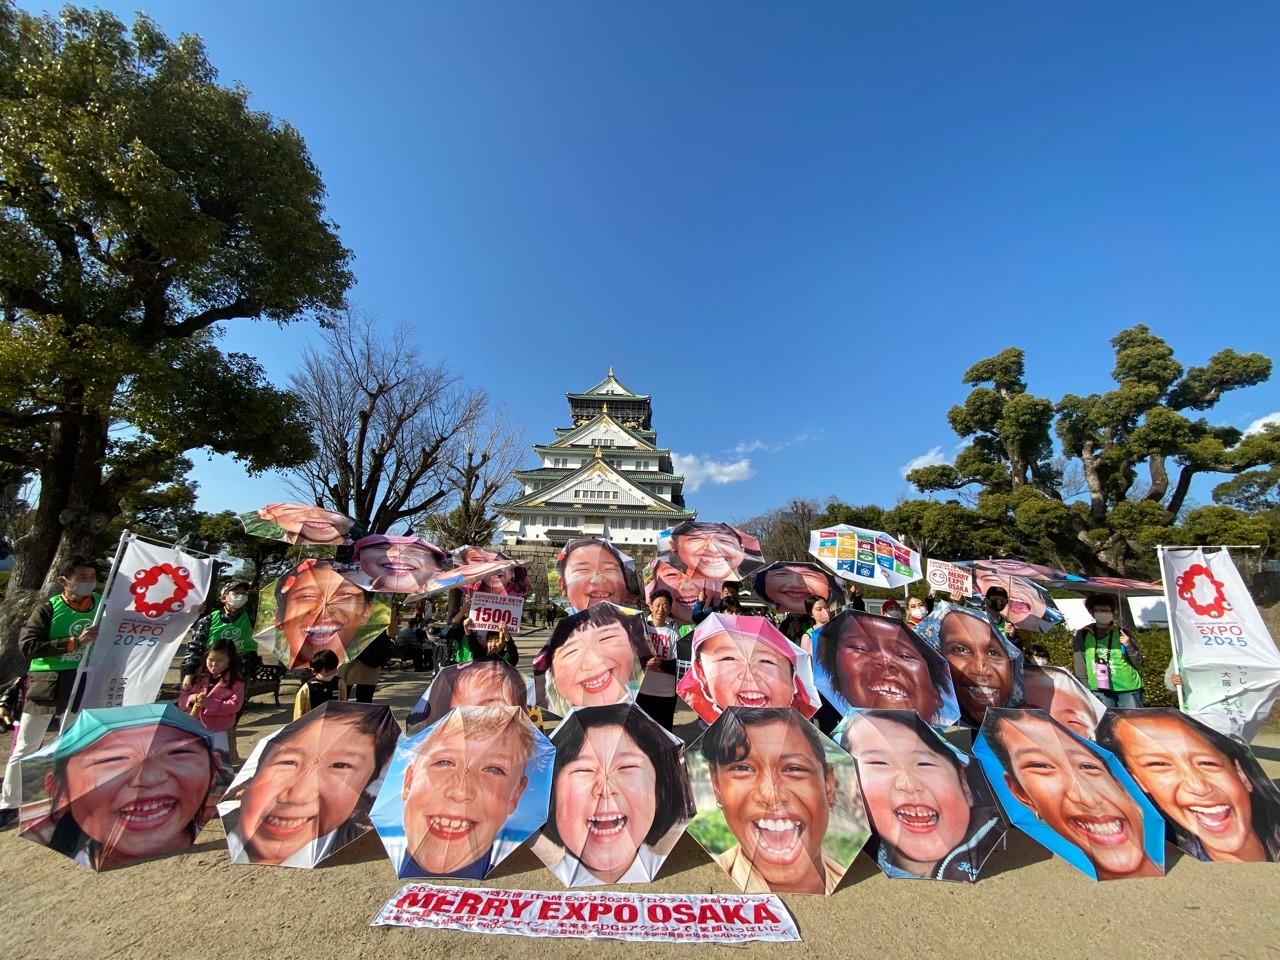 「MERRY EXPO OSAKA」ゴール・大阪城での集合写真